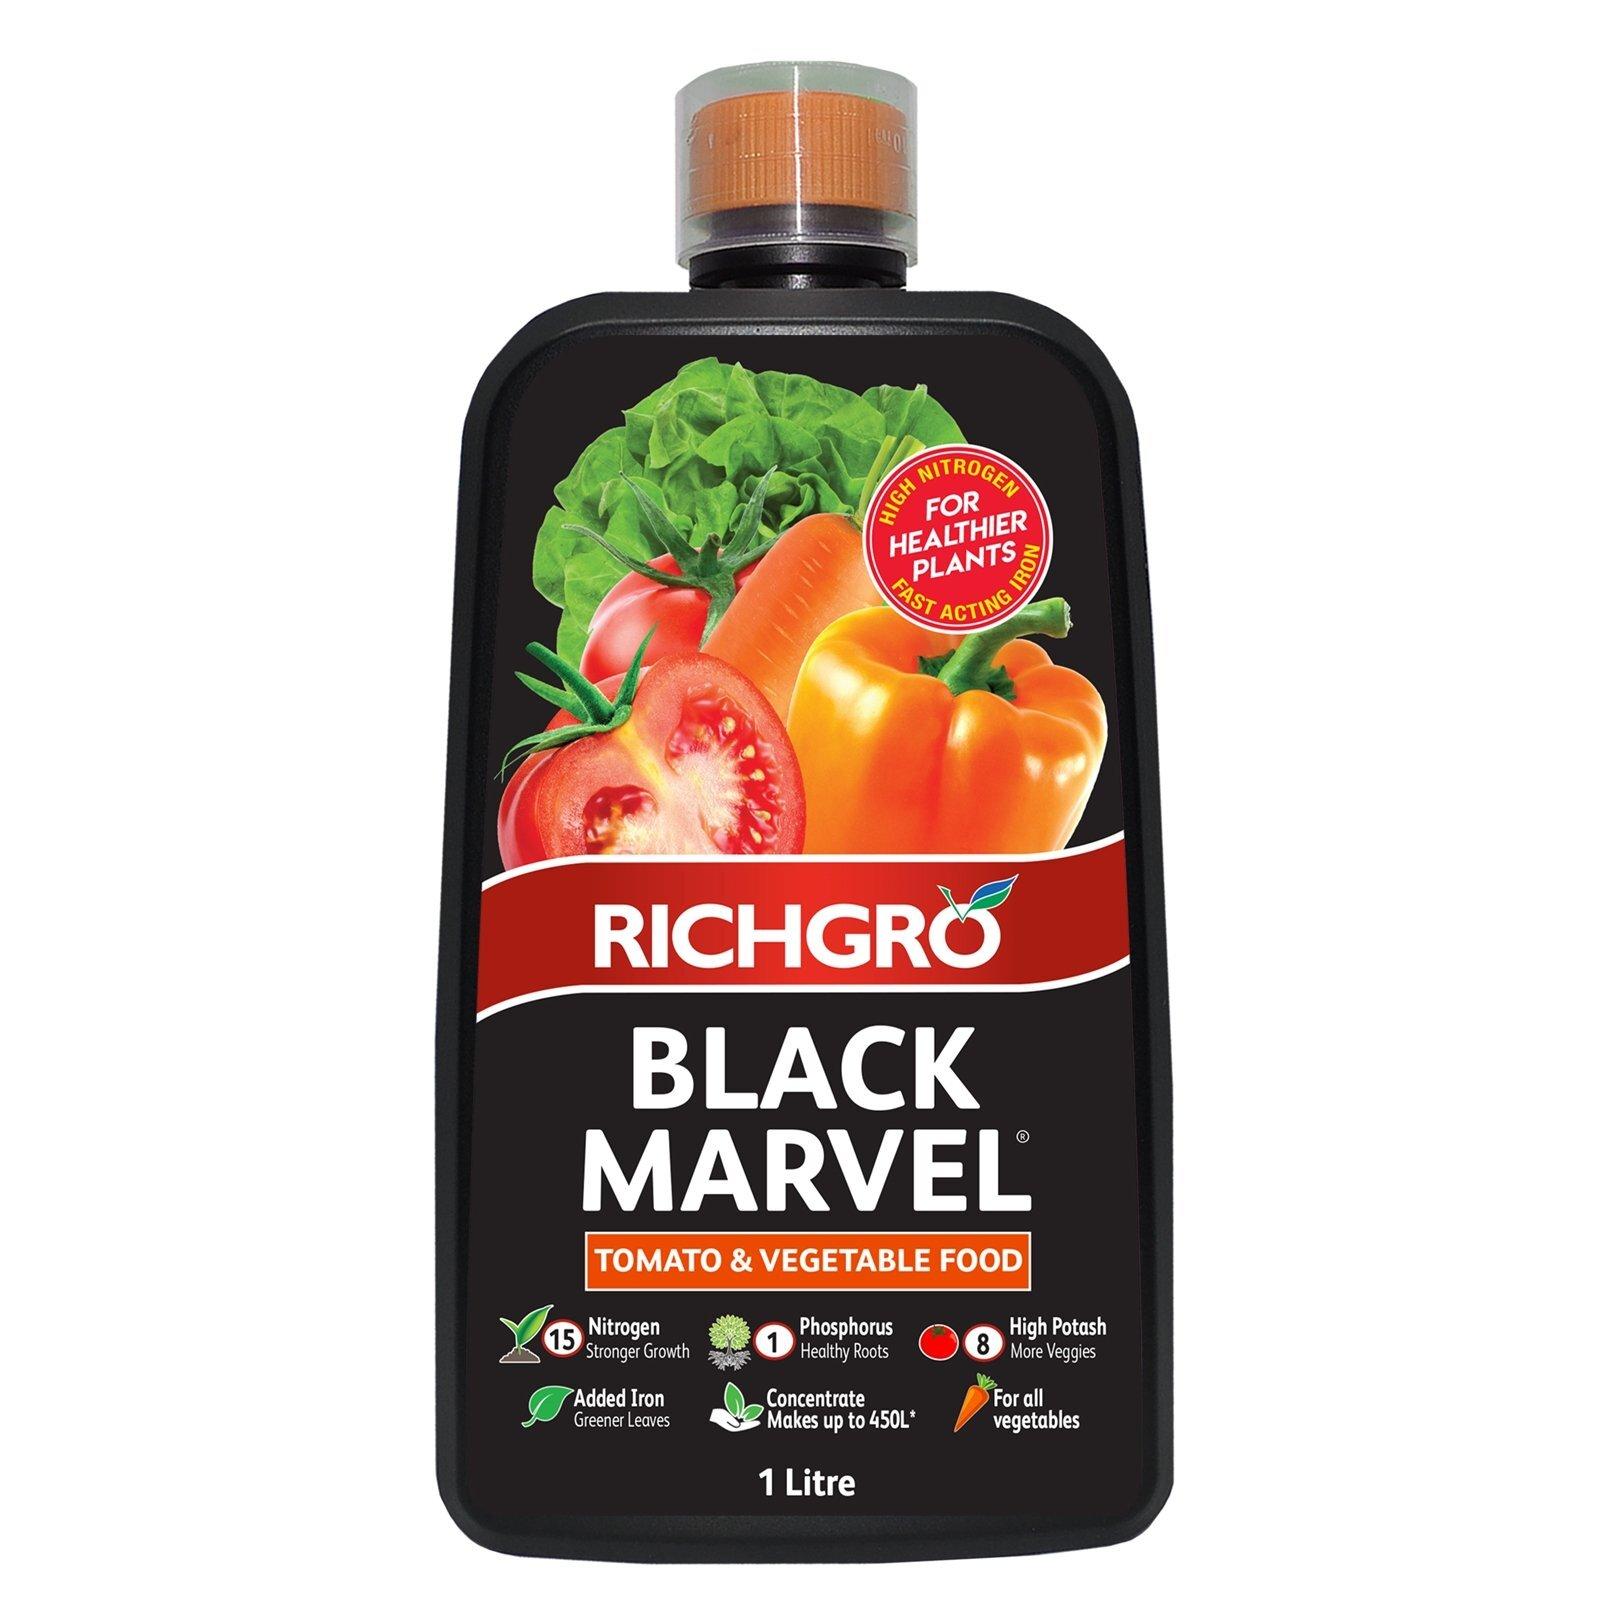 Richgro 1L Black Marvel Tomato And Vegetable Food Liquid Fertiliser Concentrate